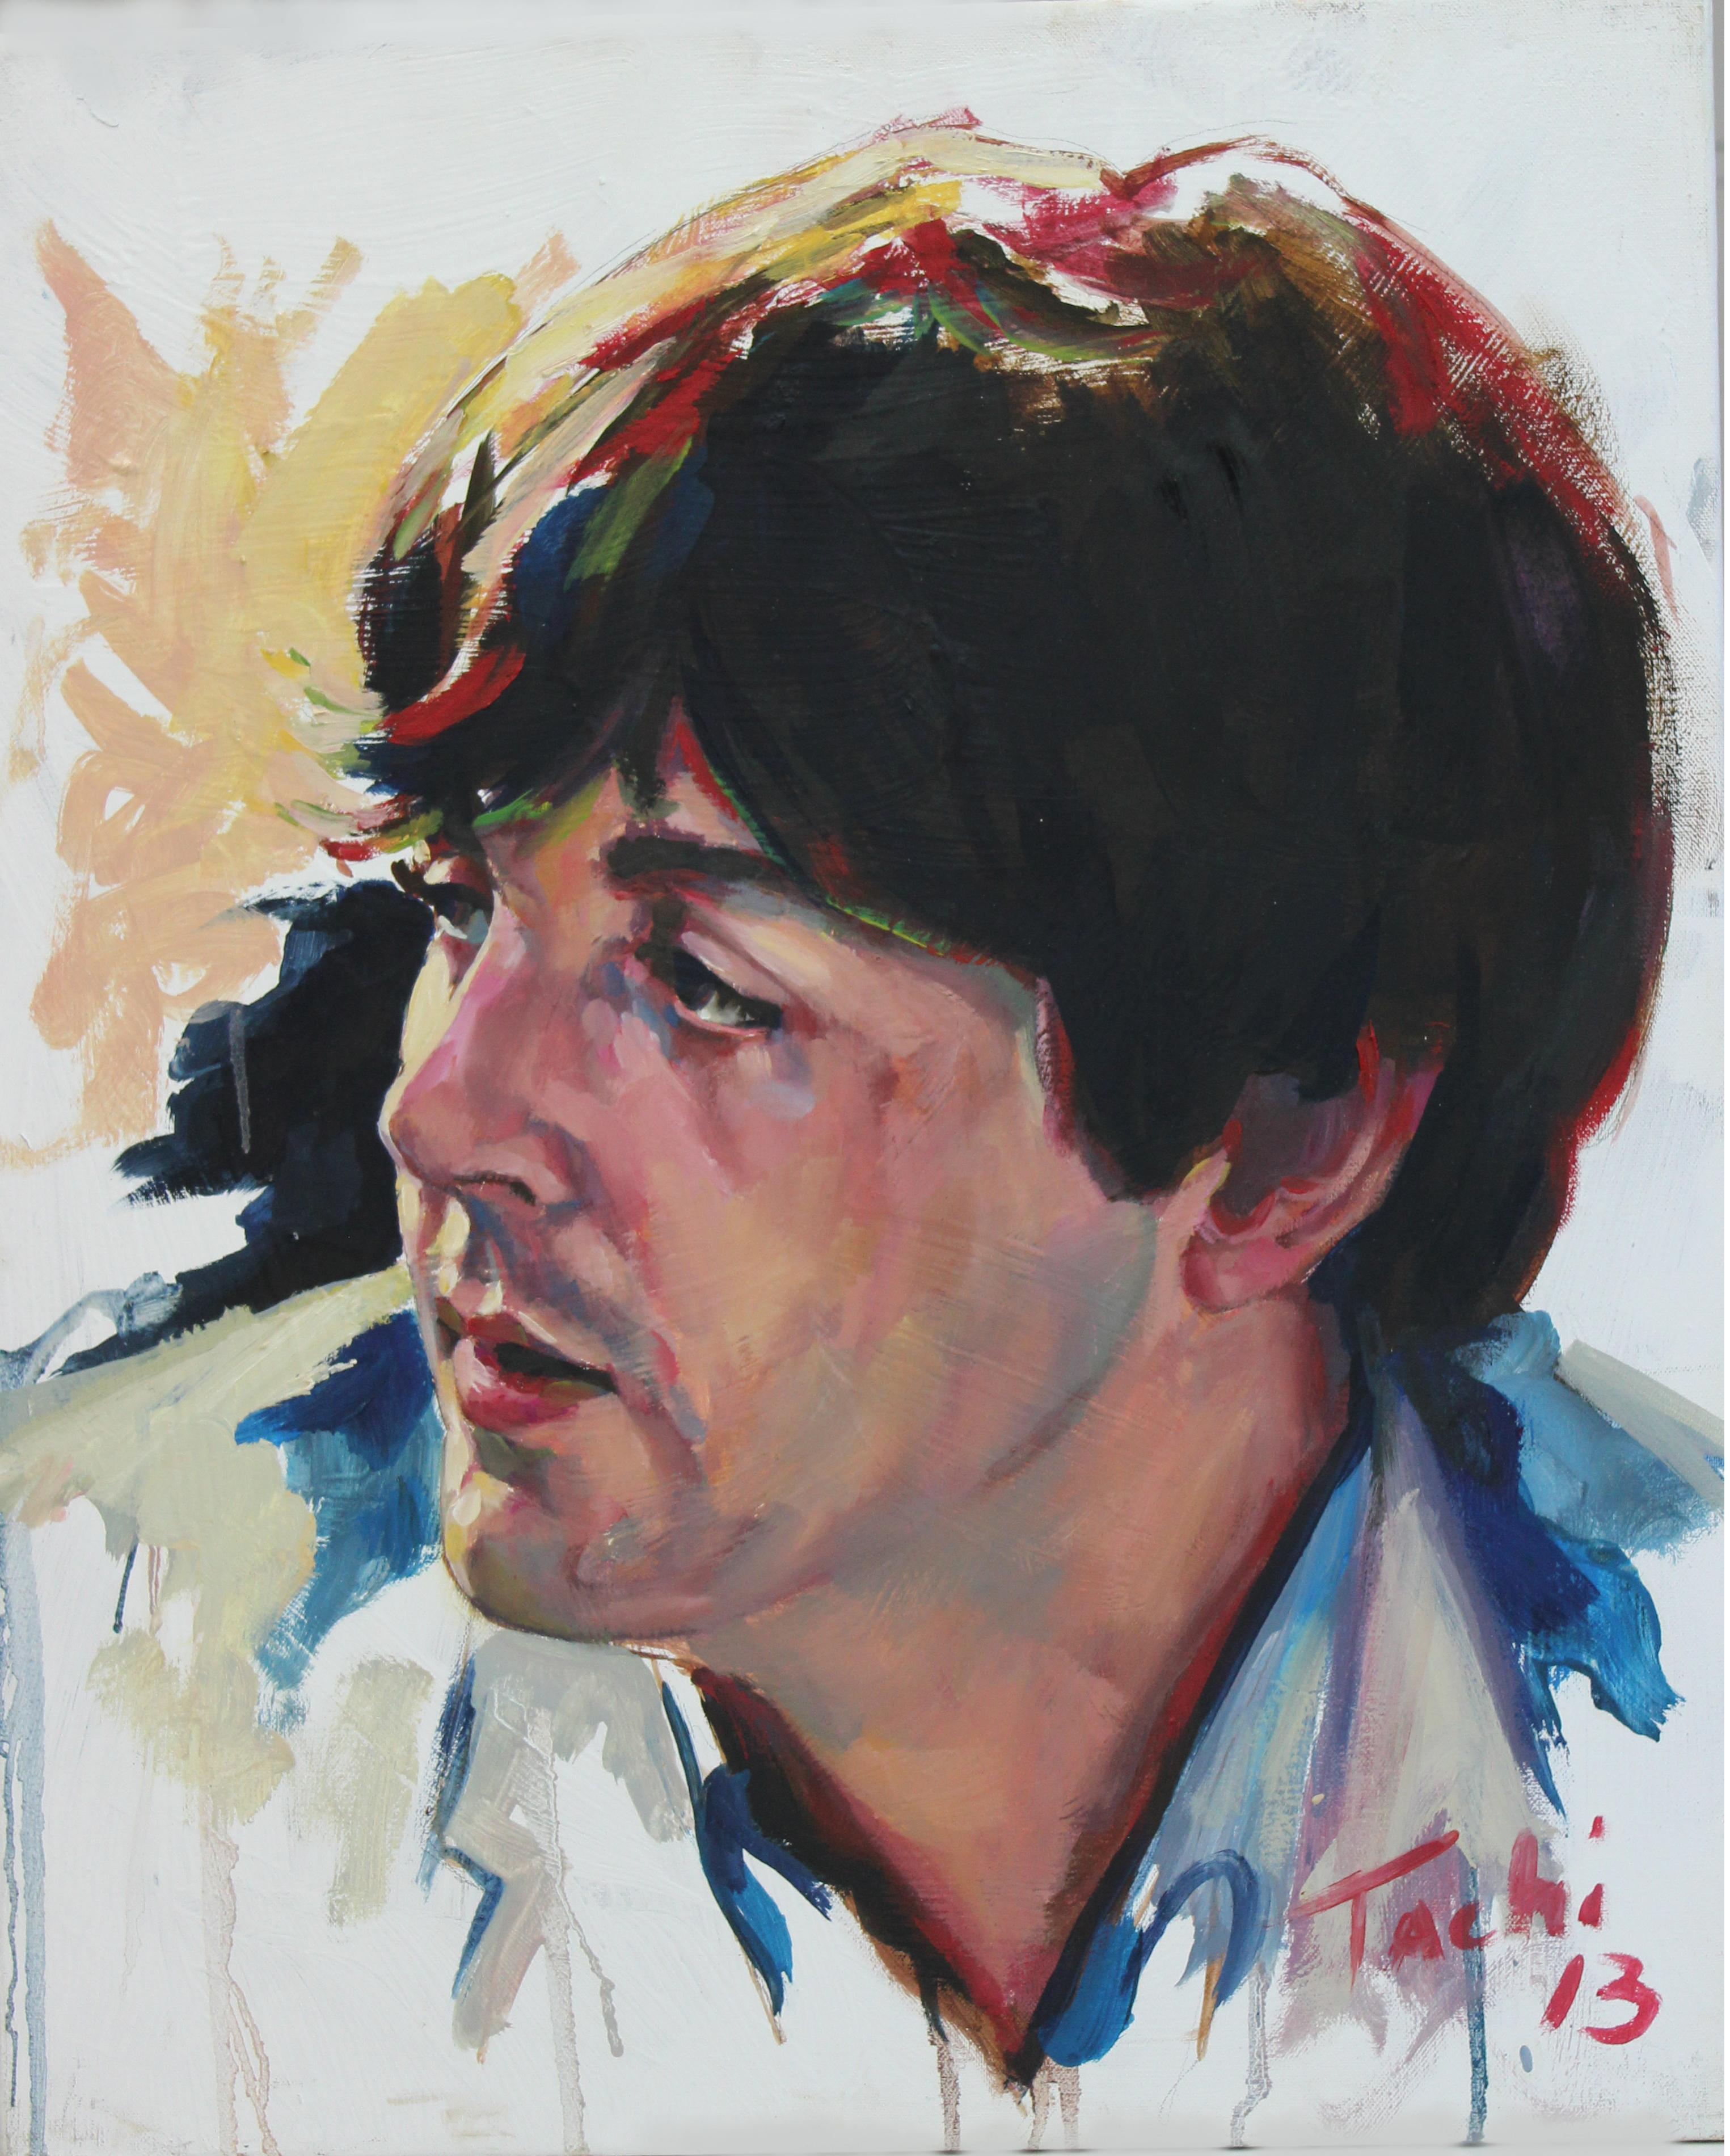 Paul Mcarney